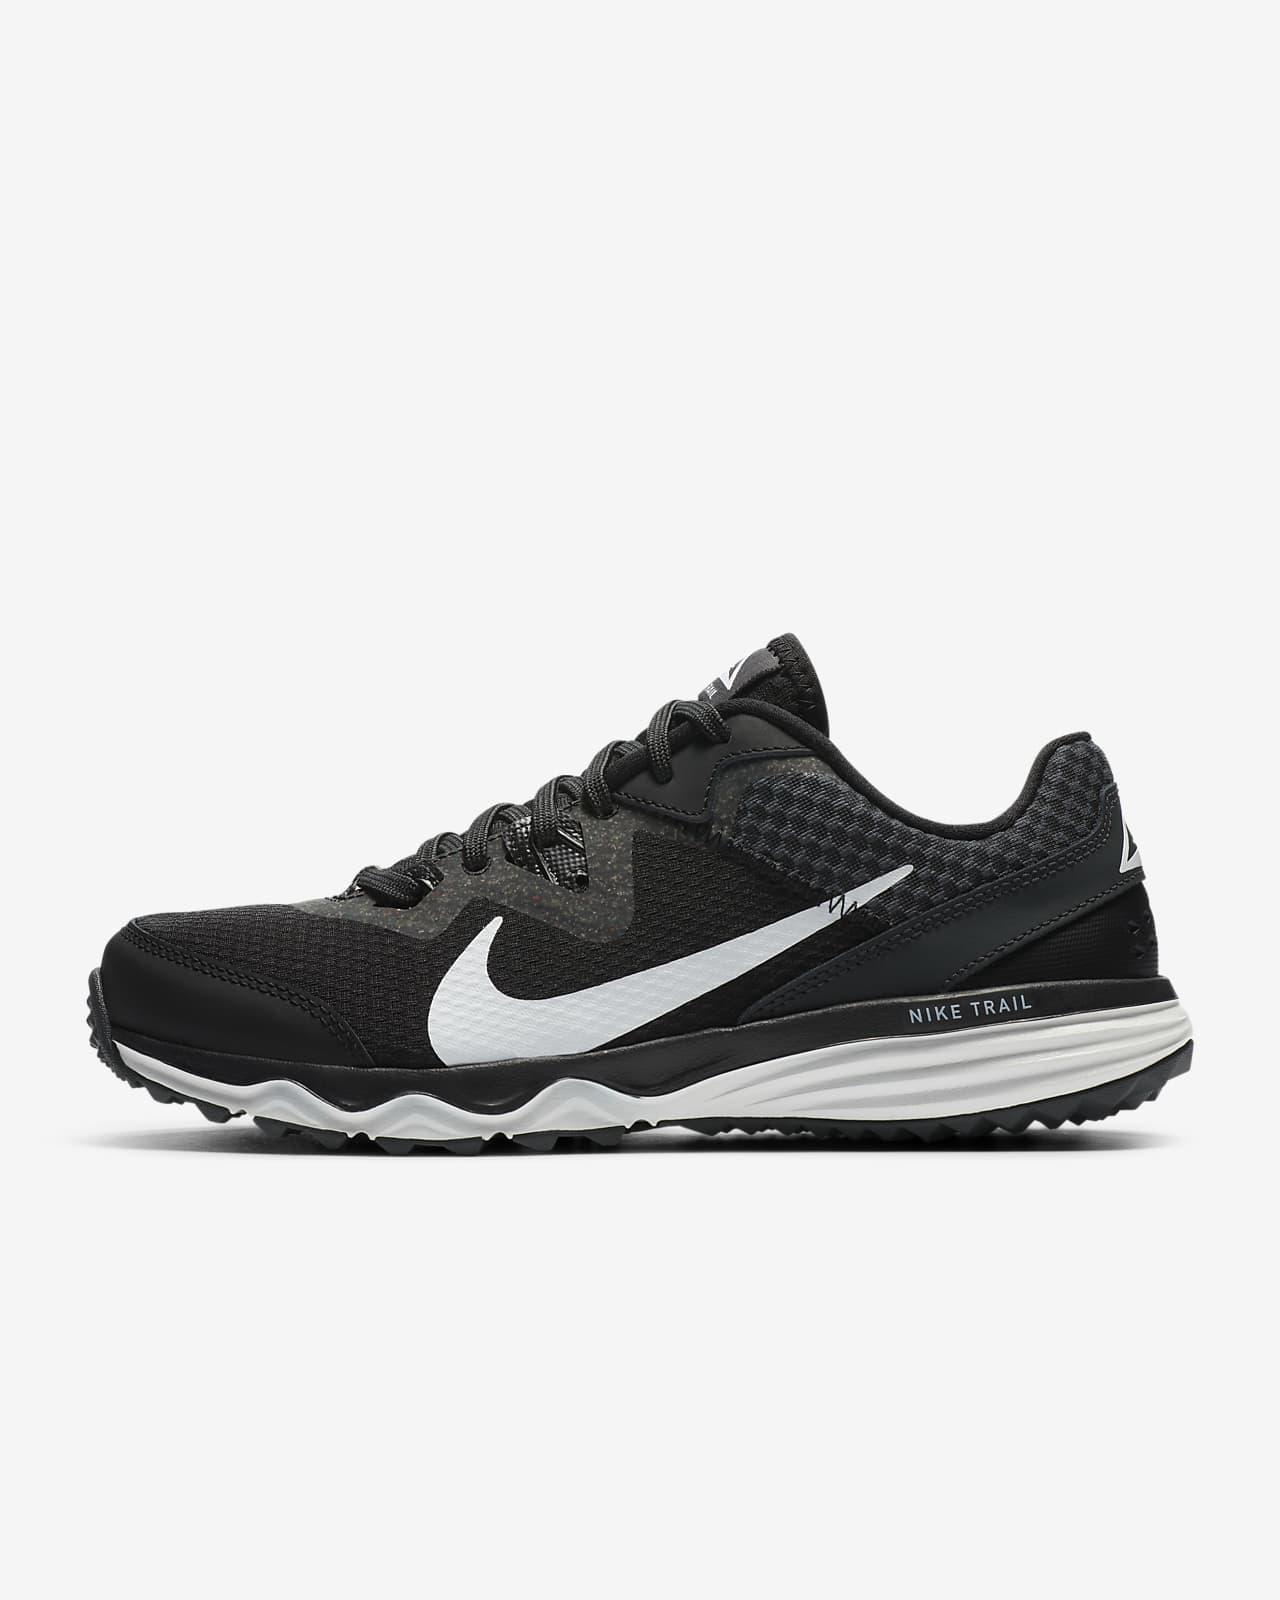 Dámská trailová bota Nike Juniper Trail